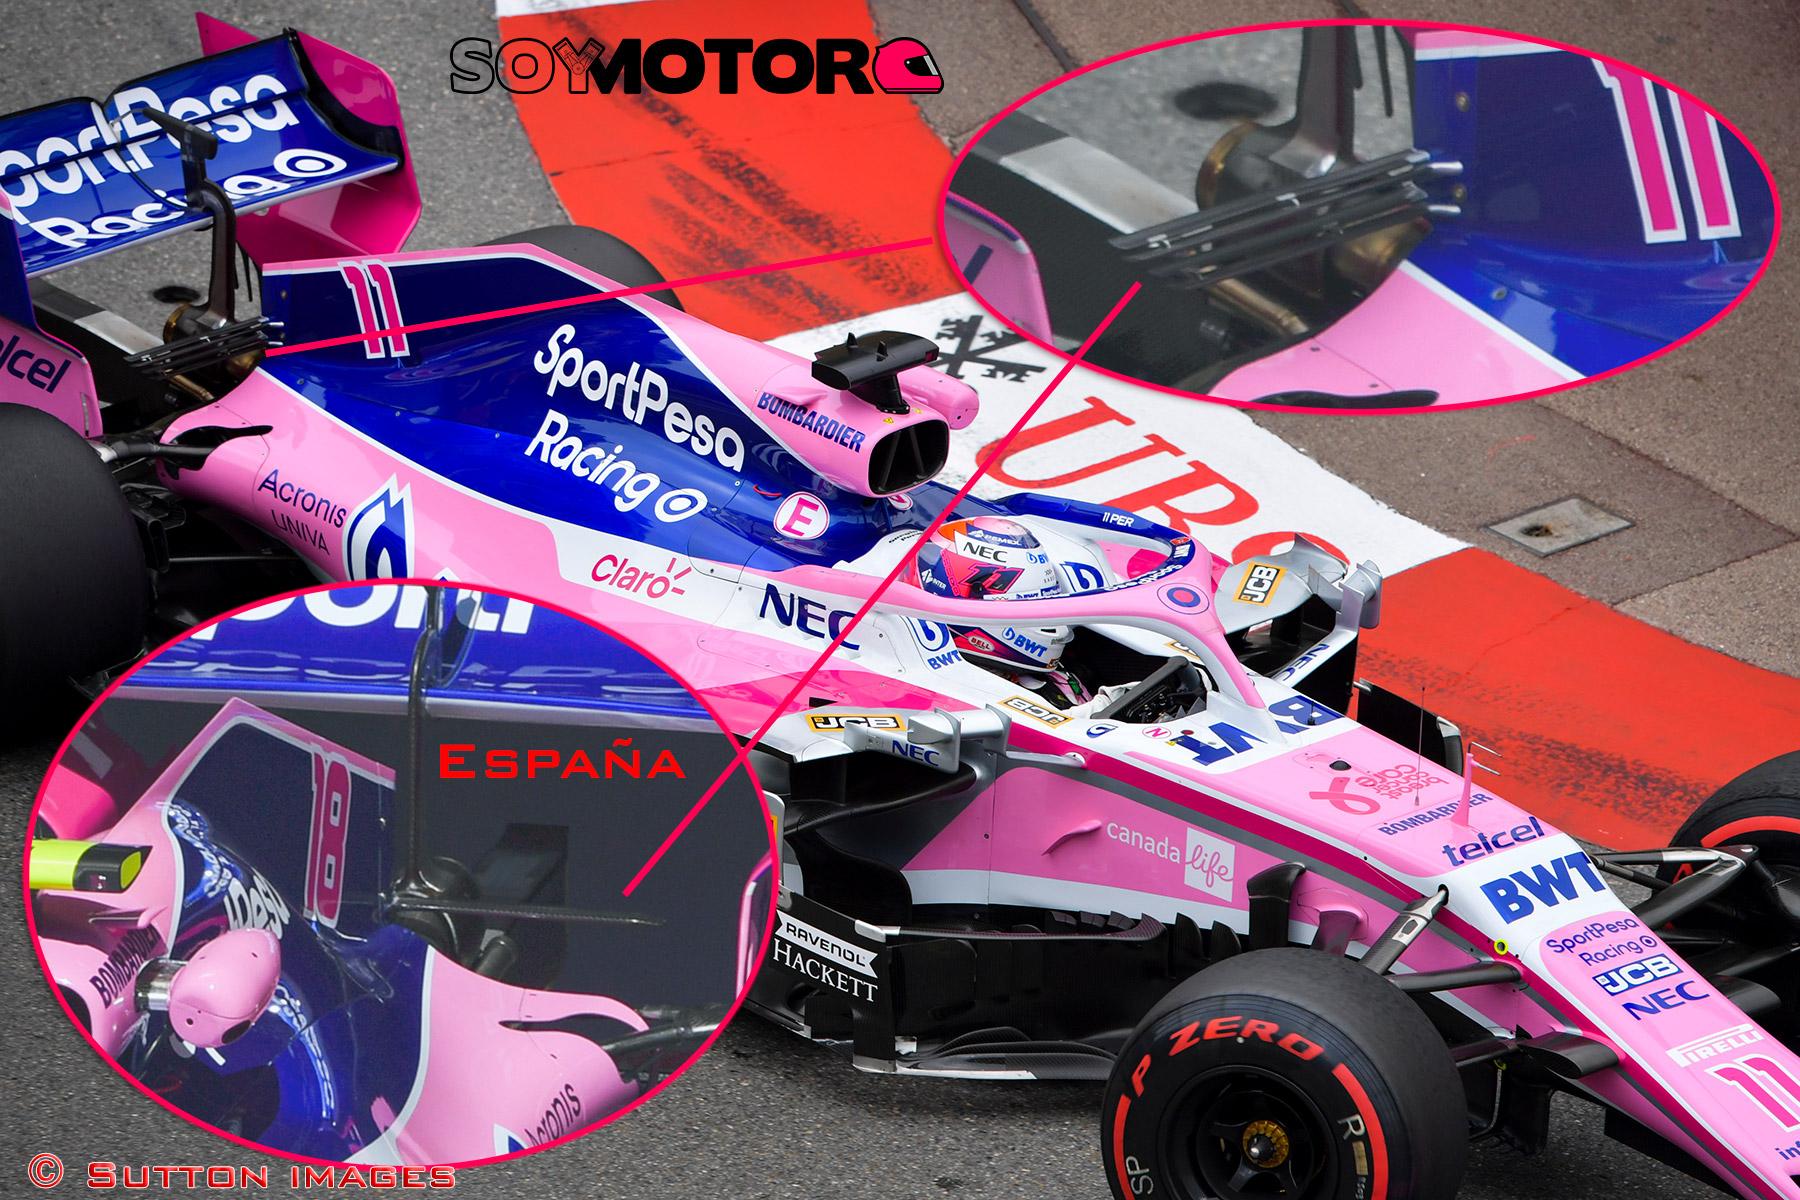 racing-point-t-wing-soymotor.jpg